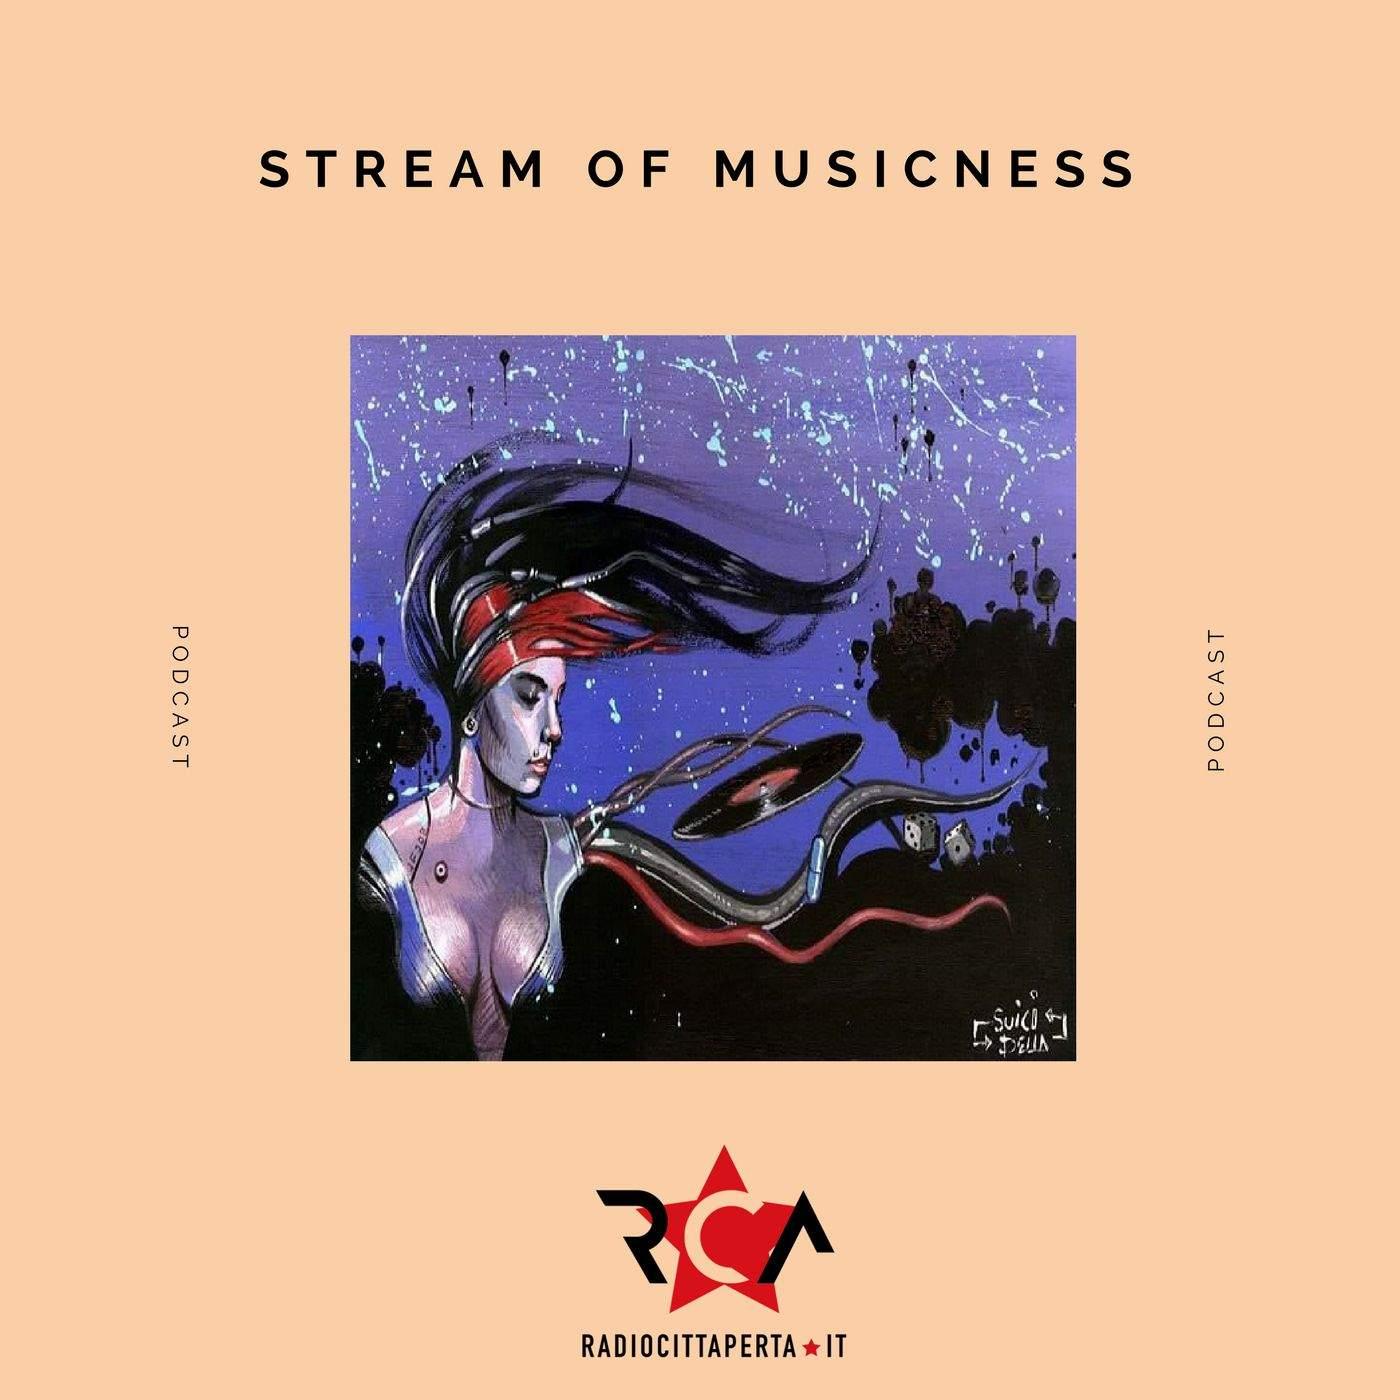 STREAM OF MUSICNESS con KAROL